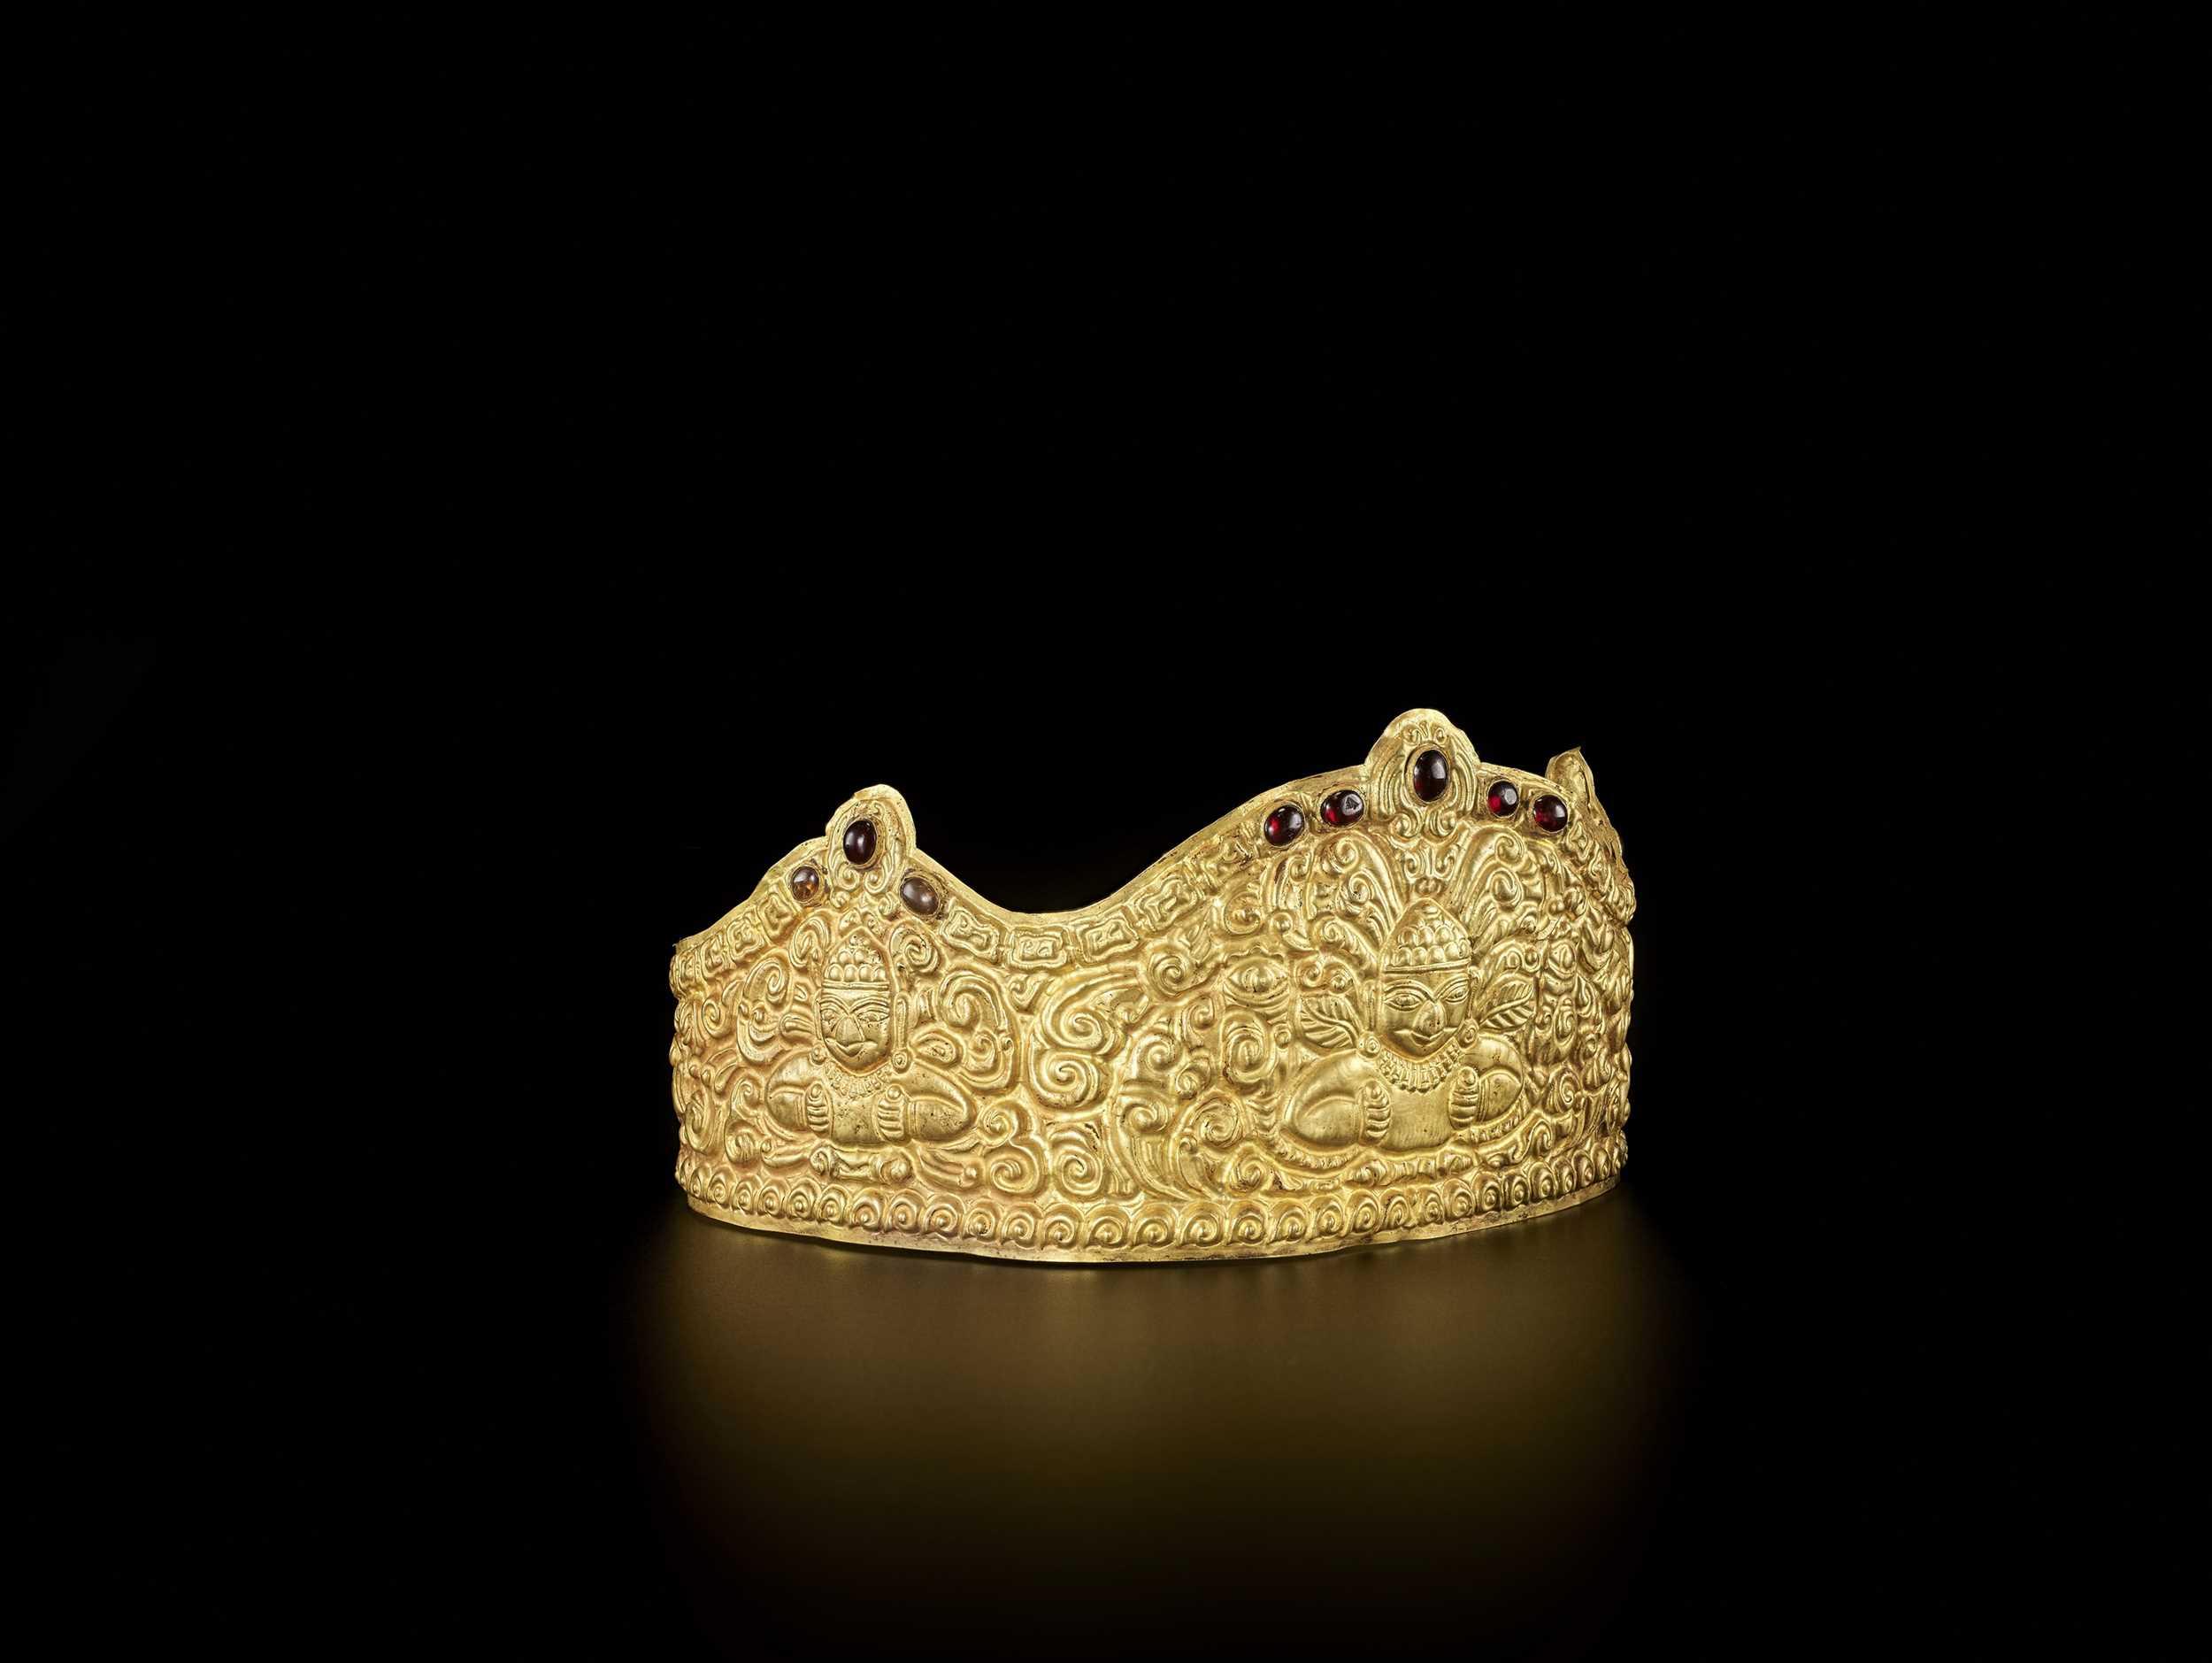 AN EXTRE MELY RARE AND FINE CHAM GEMSTONE-SET GOLD REPOUSSÉ CROWN WITH GARUDAS - Bild 4 aus 9